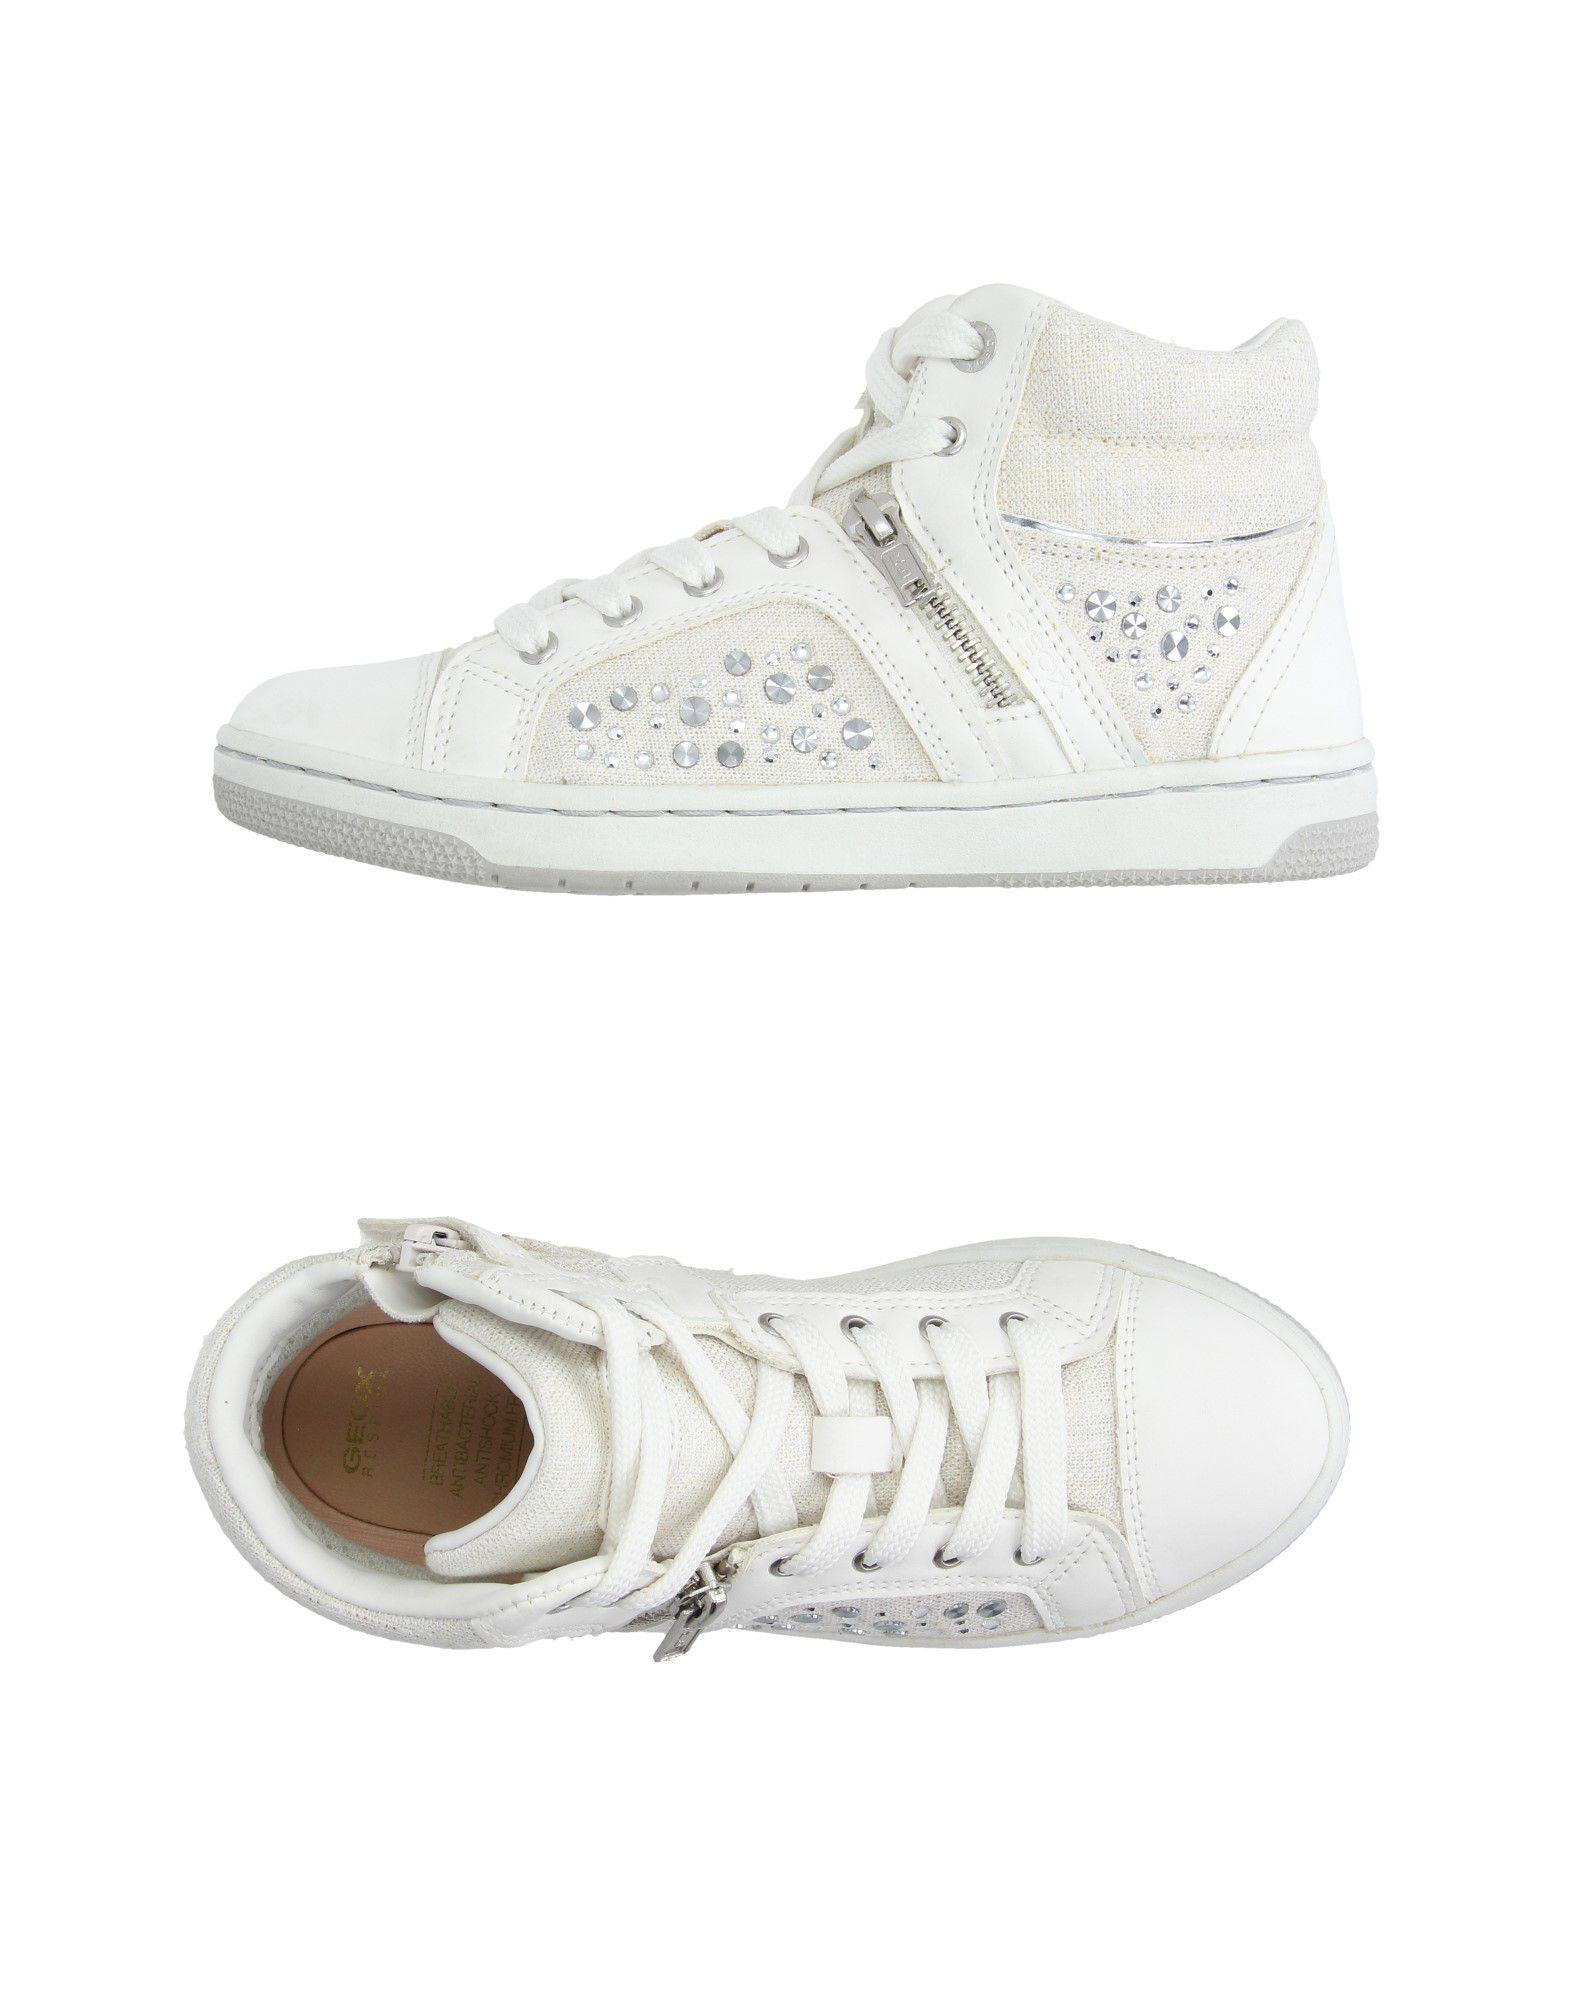 Suburbio profesional Desempacando  Geox Sneakers Girl 9-16 years online on YOOX Canada   Sneakers, Geox, High  tops sneakers